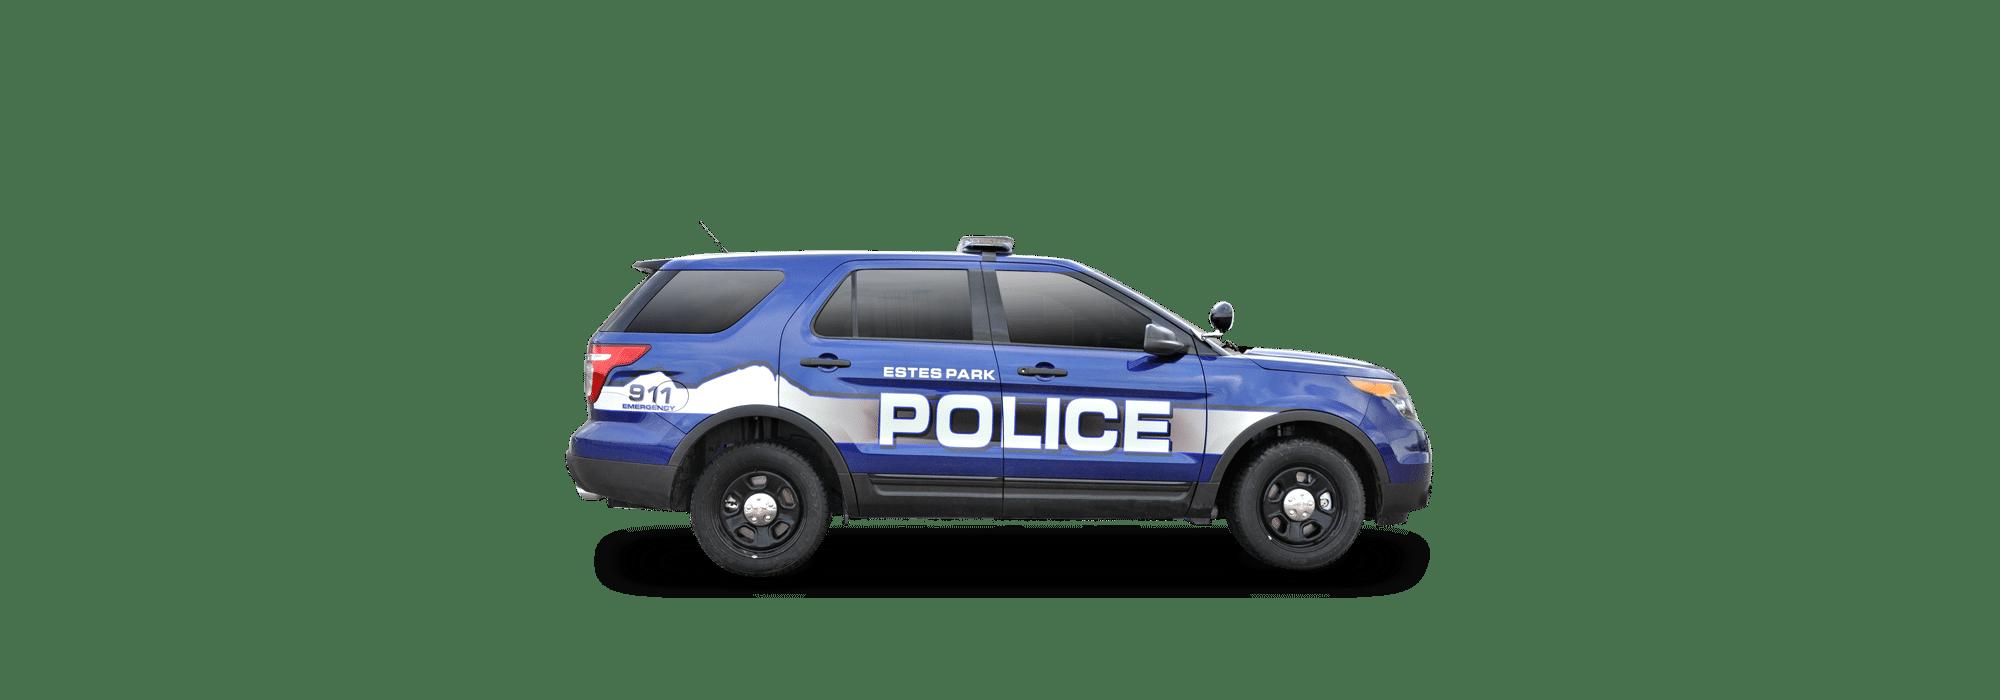 Svi Custom Vehicle Graphics Reflective Vehicle Graphics